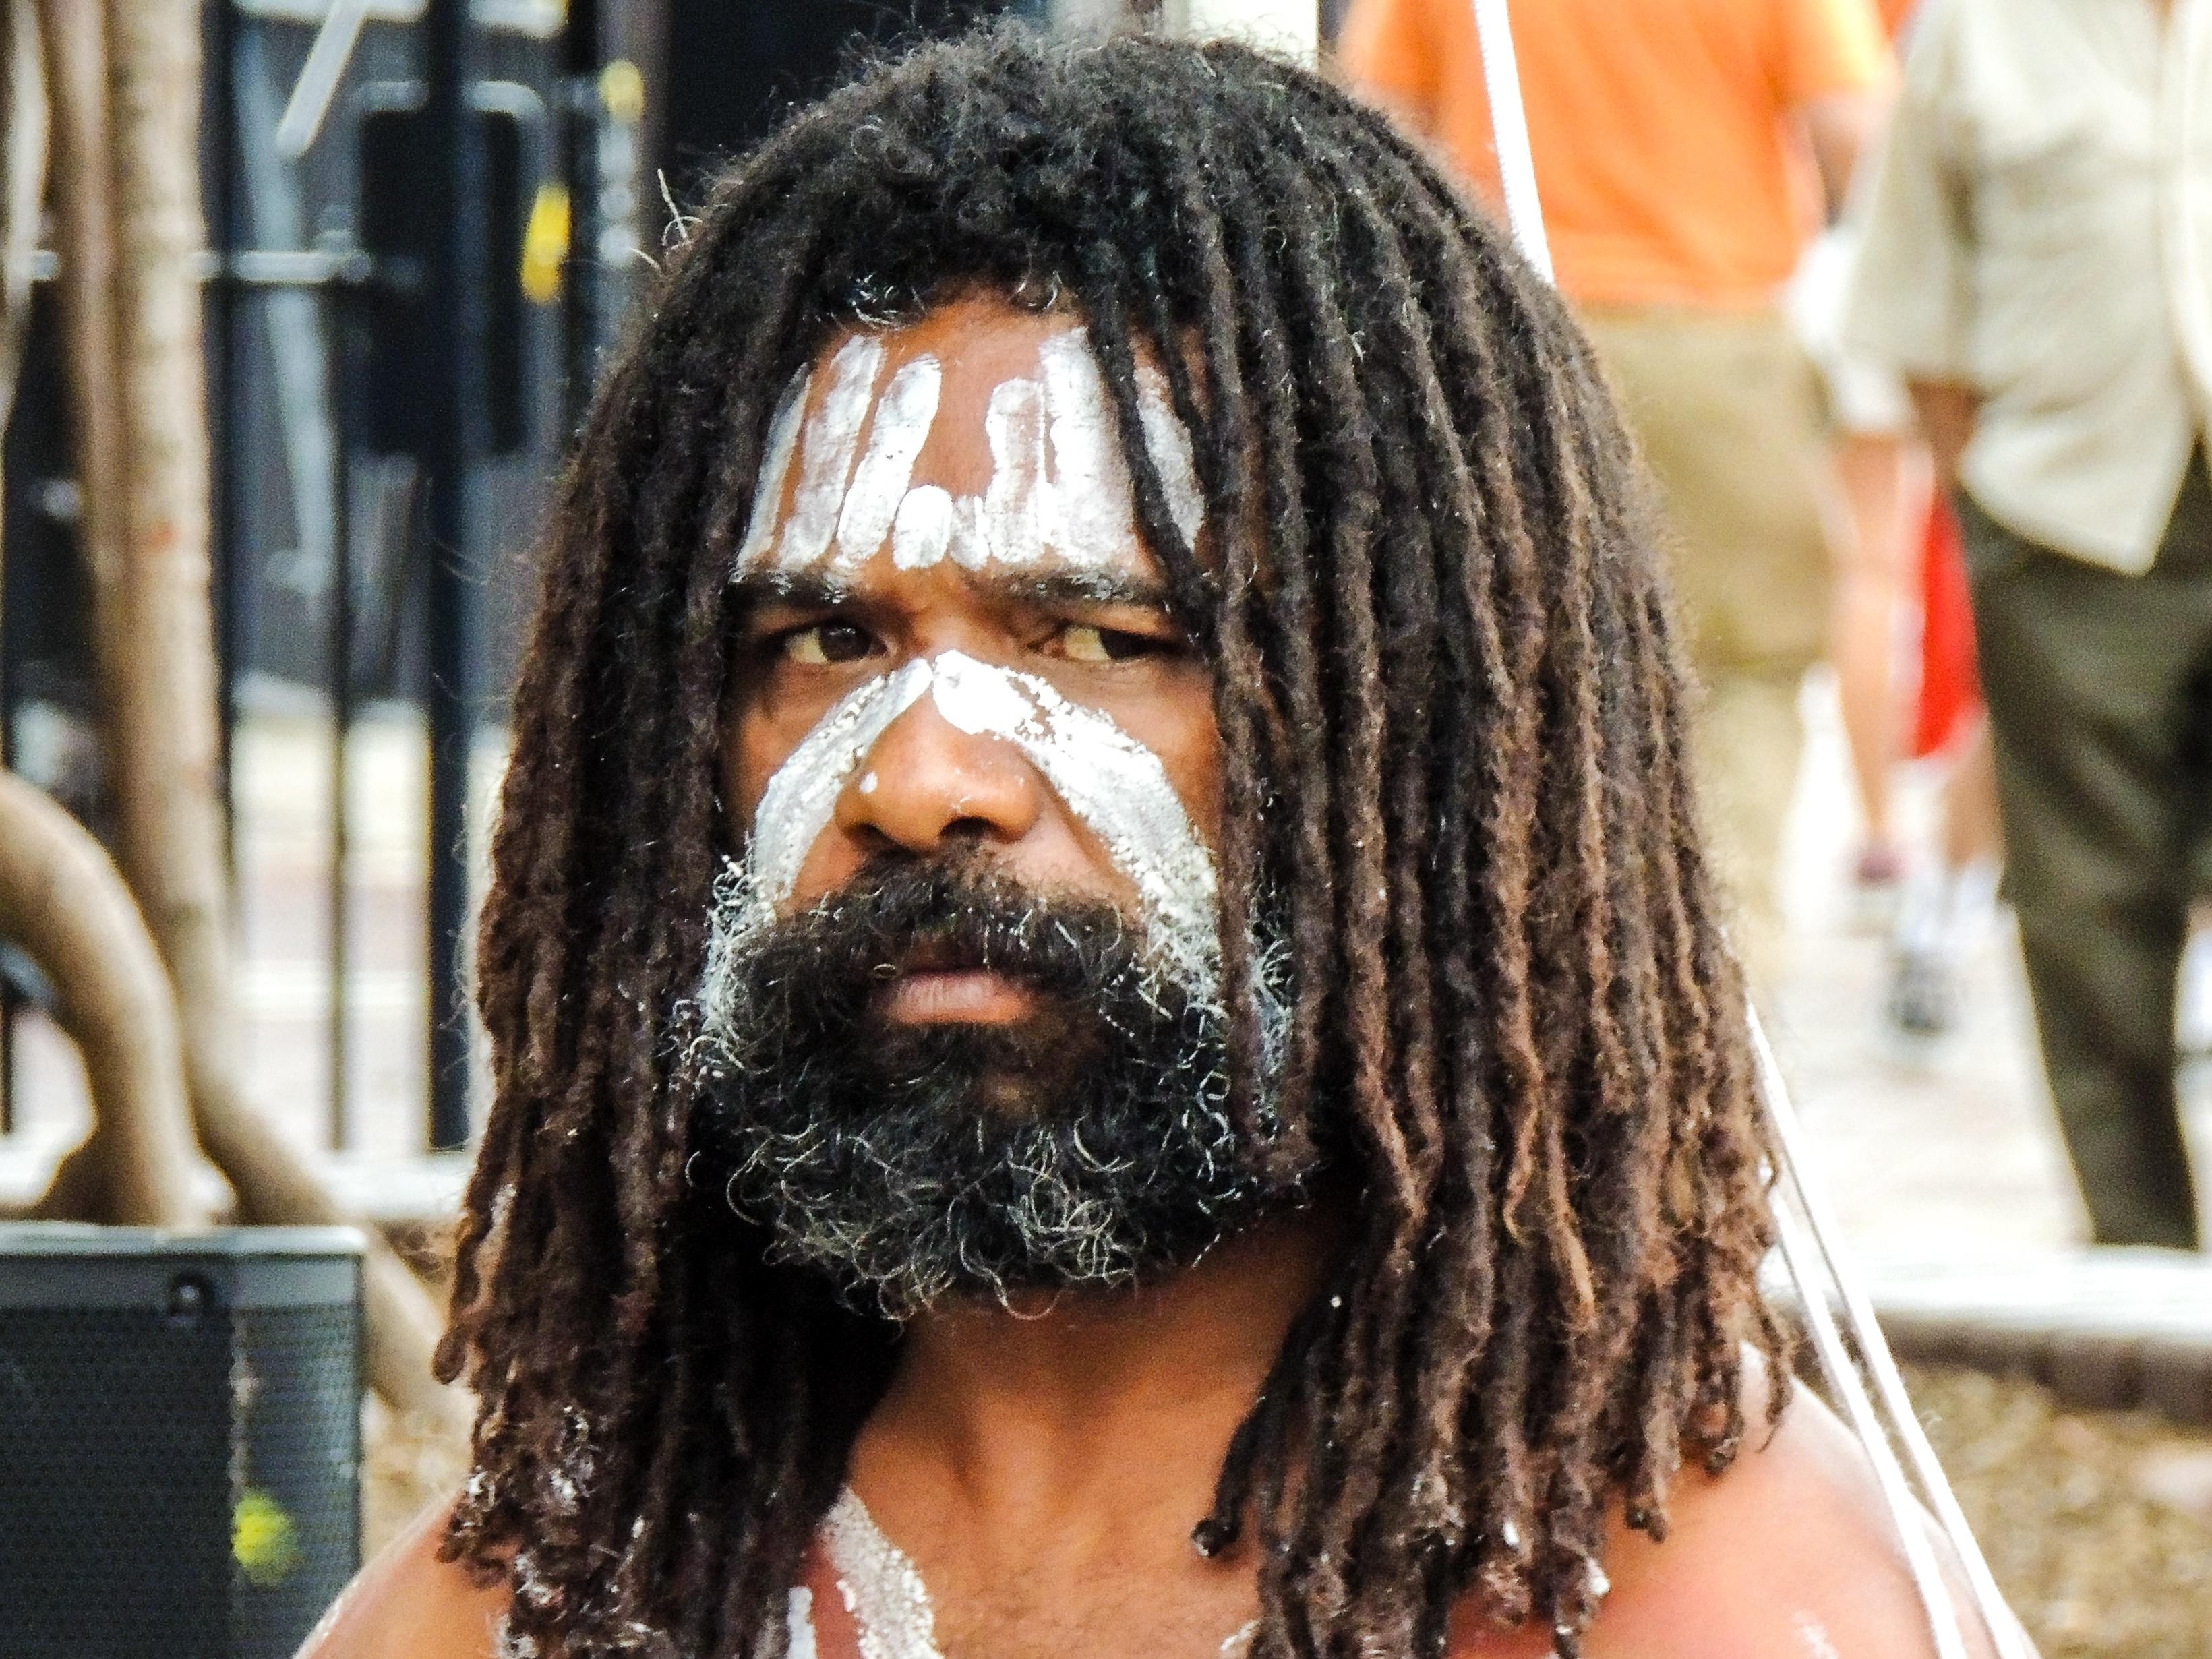 Fotos Gratis Hombre Gente Cabello Peinado Barba Pelo Largo - Hombre-con-pelo-largo